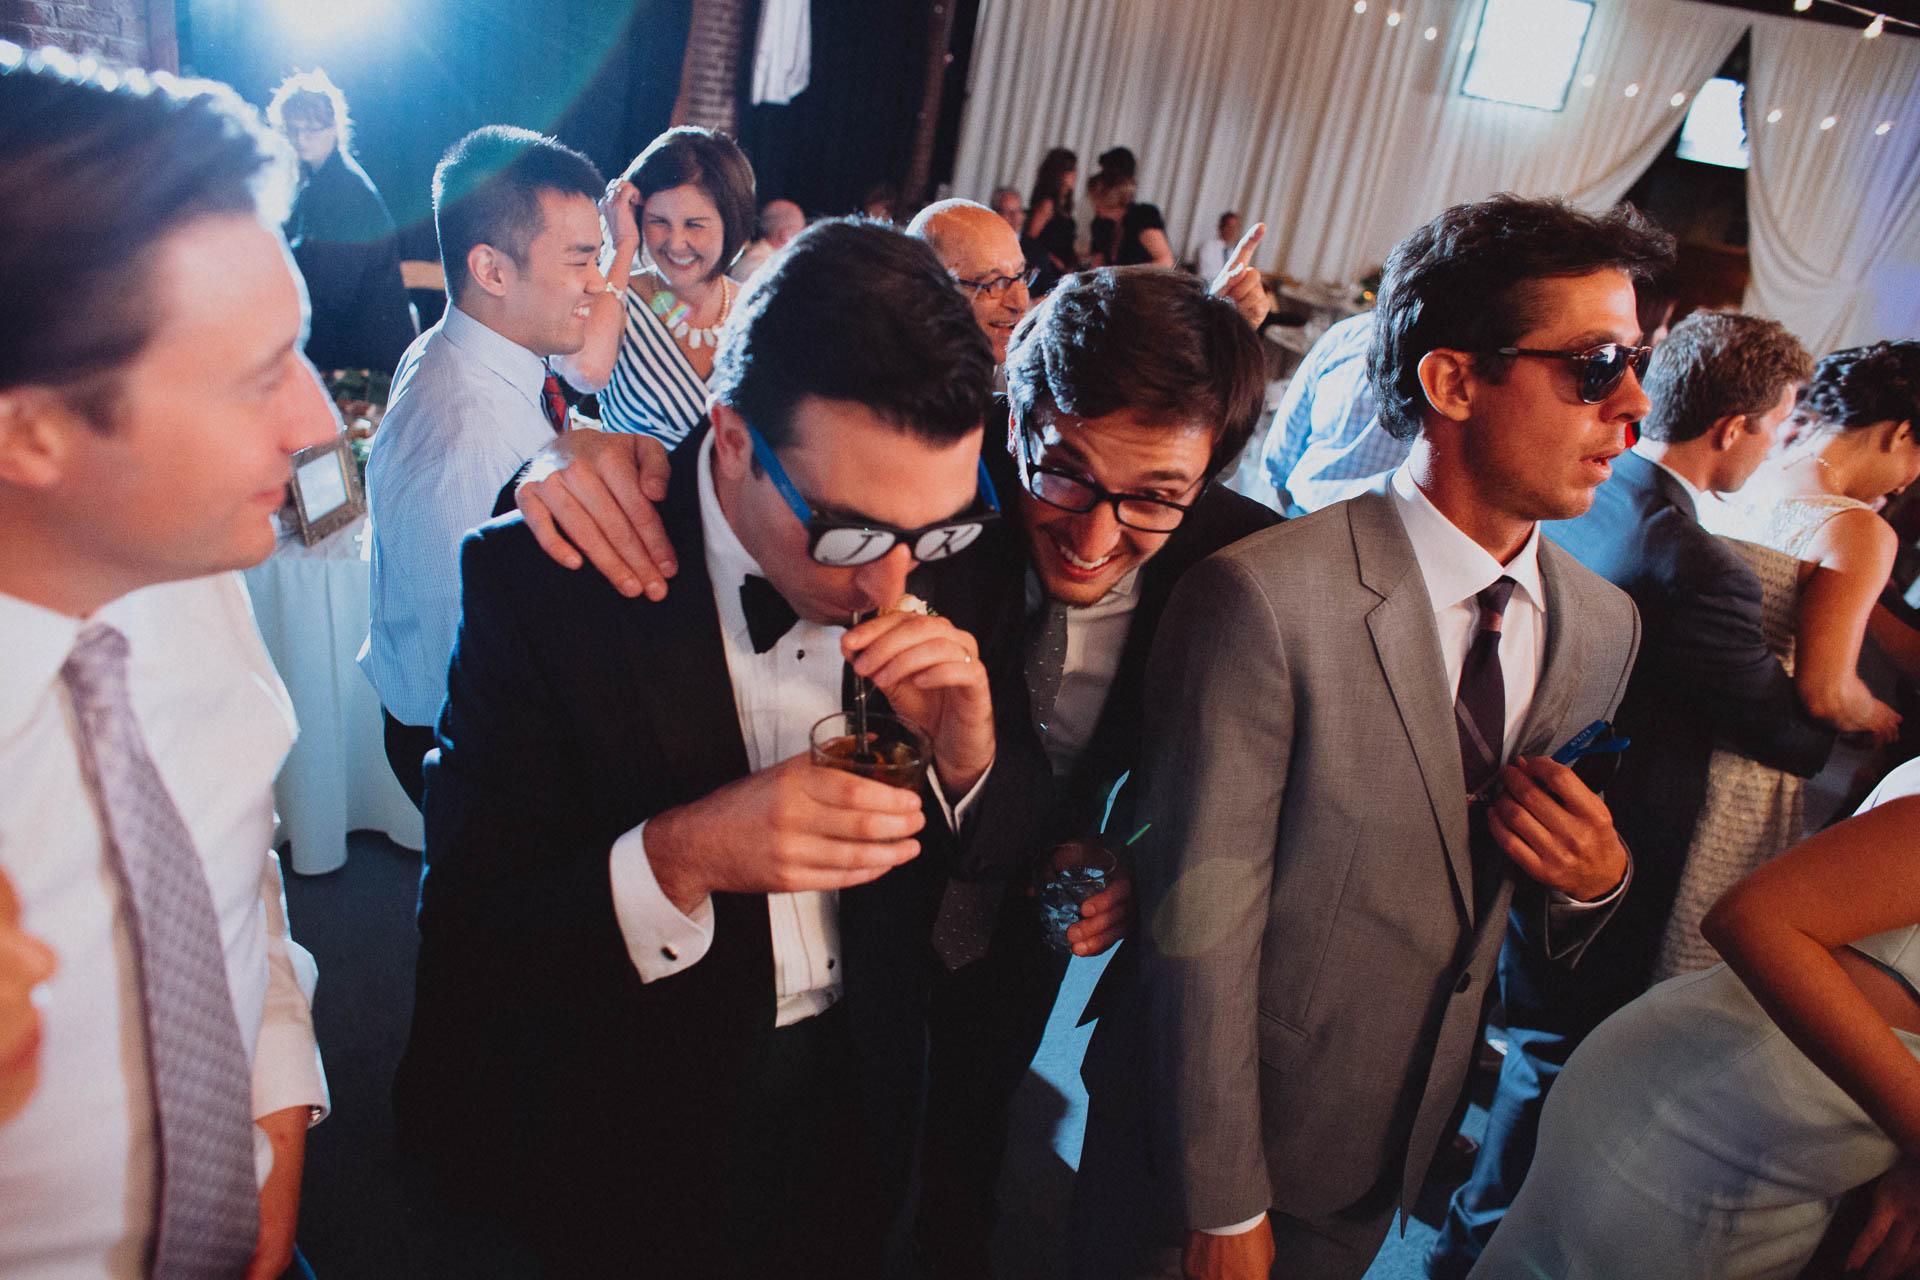 Keri-Joseph-Top-of-the-Market-Wedding-196@2x.jpg